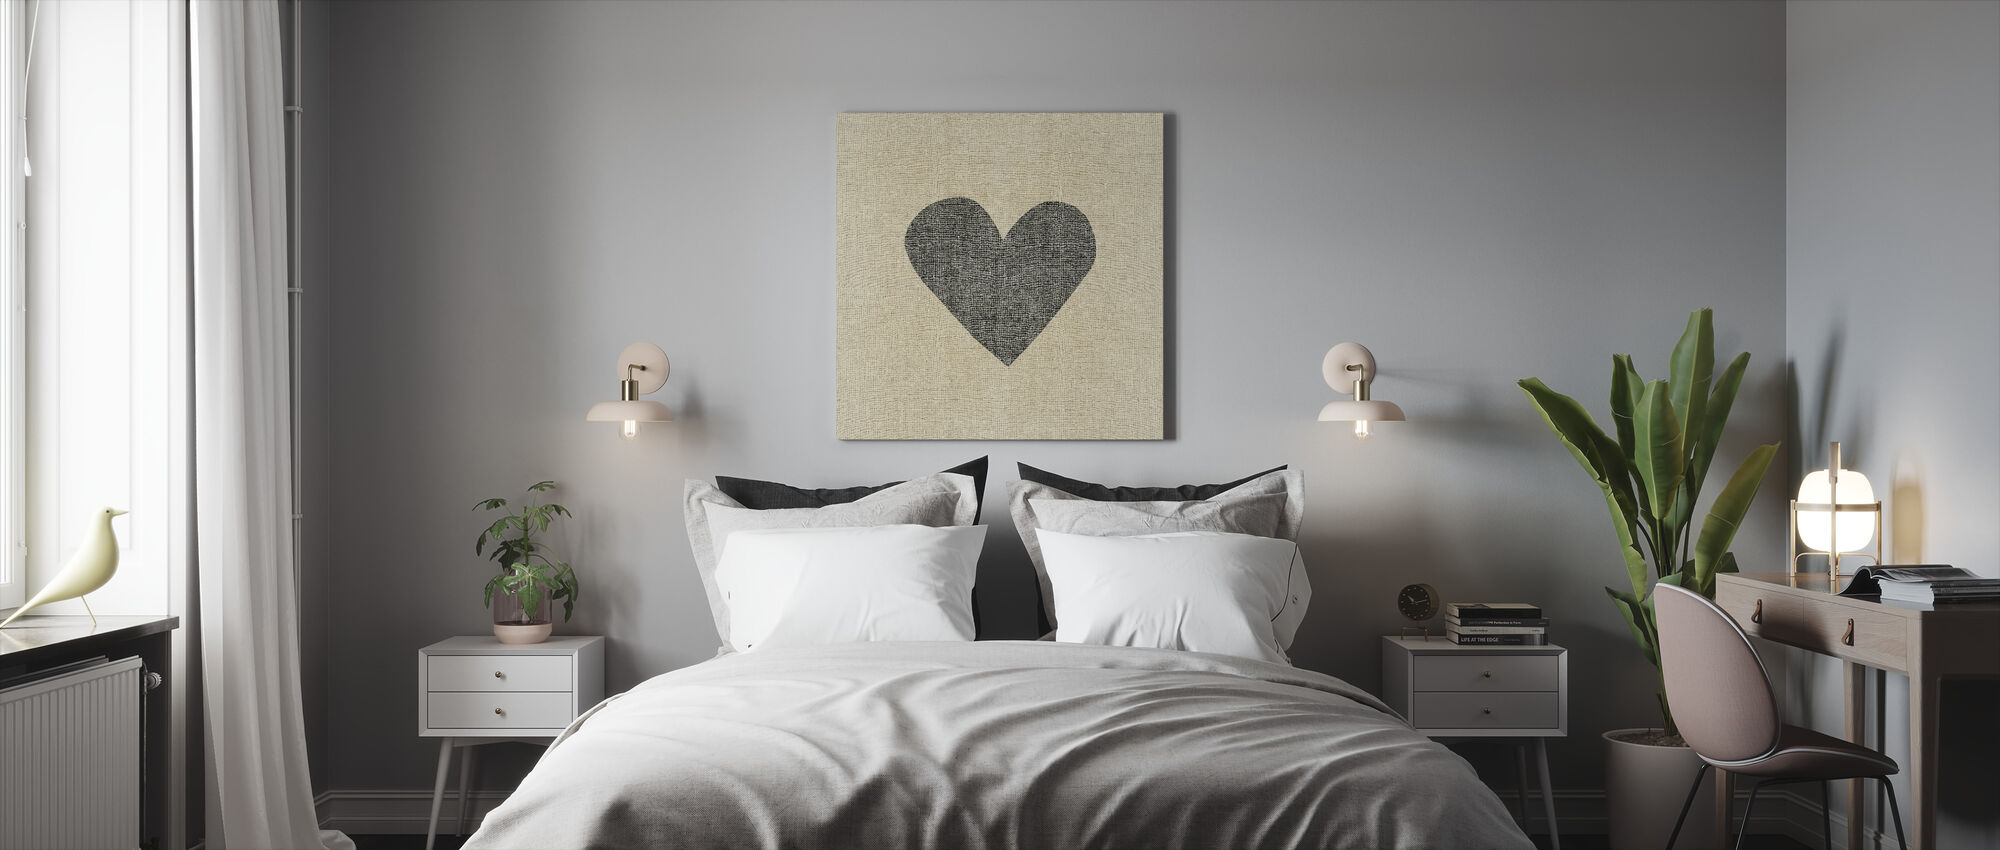 Simple Message Heart - Canvas print - Bedroom